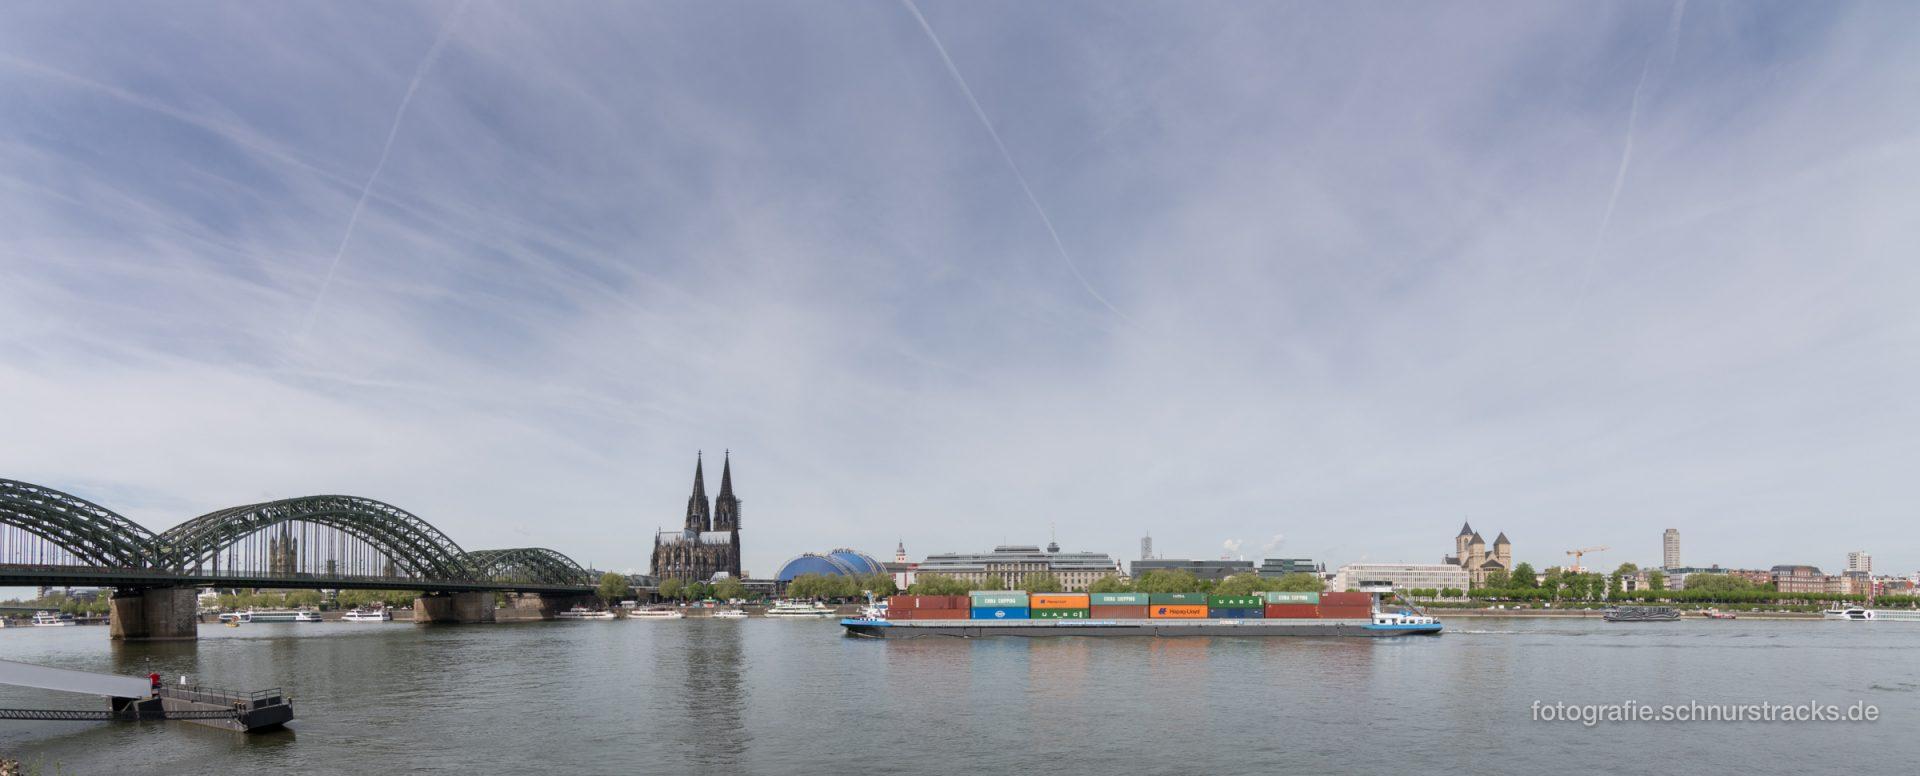 Containerschiff im Kölnpanorama #1624